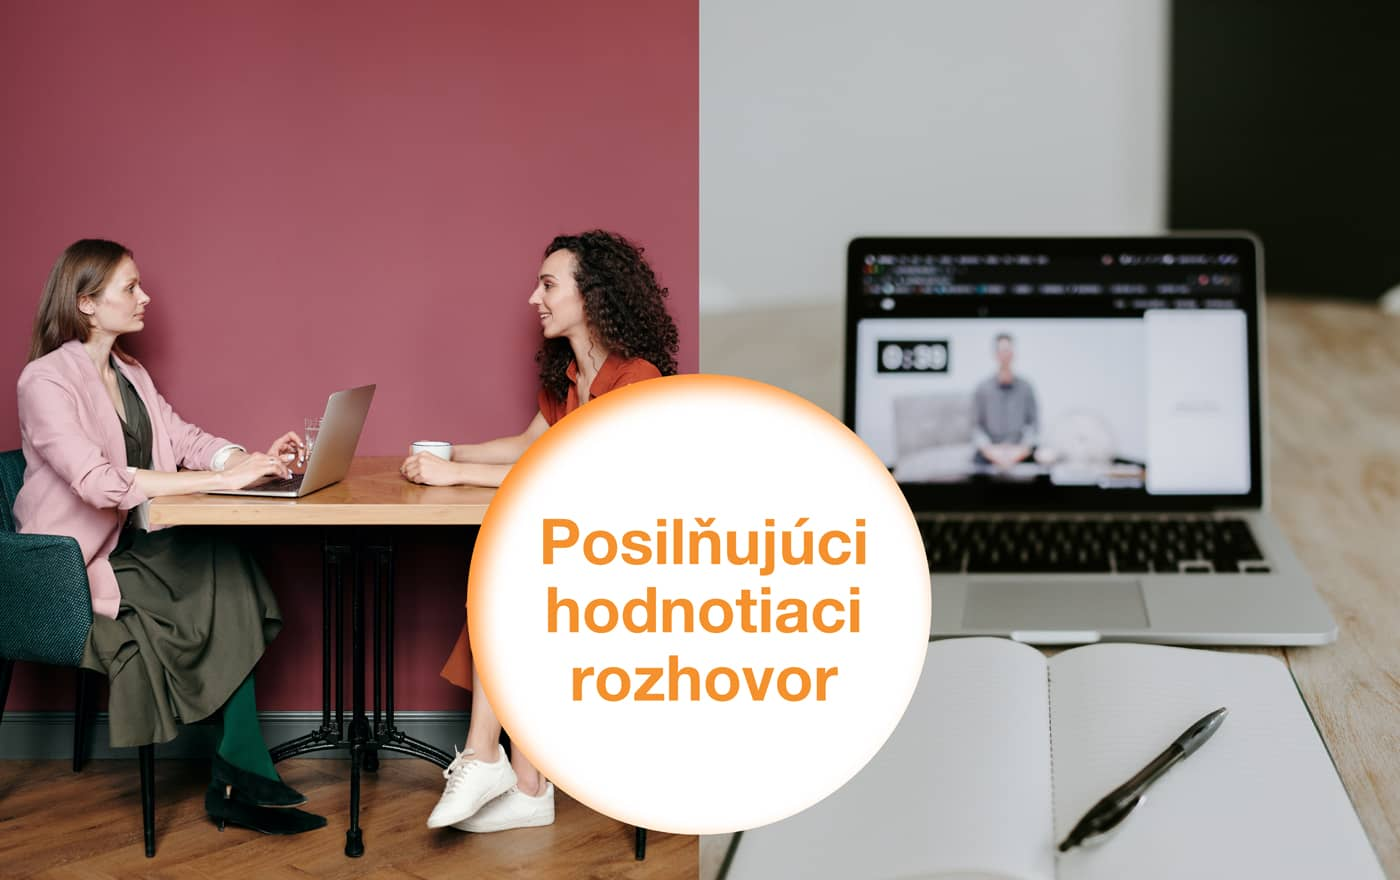 pe_banner-novinky-hodnot-rozhovor-700x440@2x-c